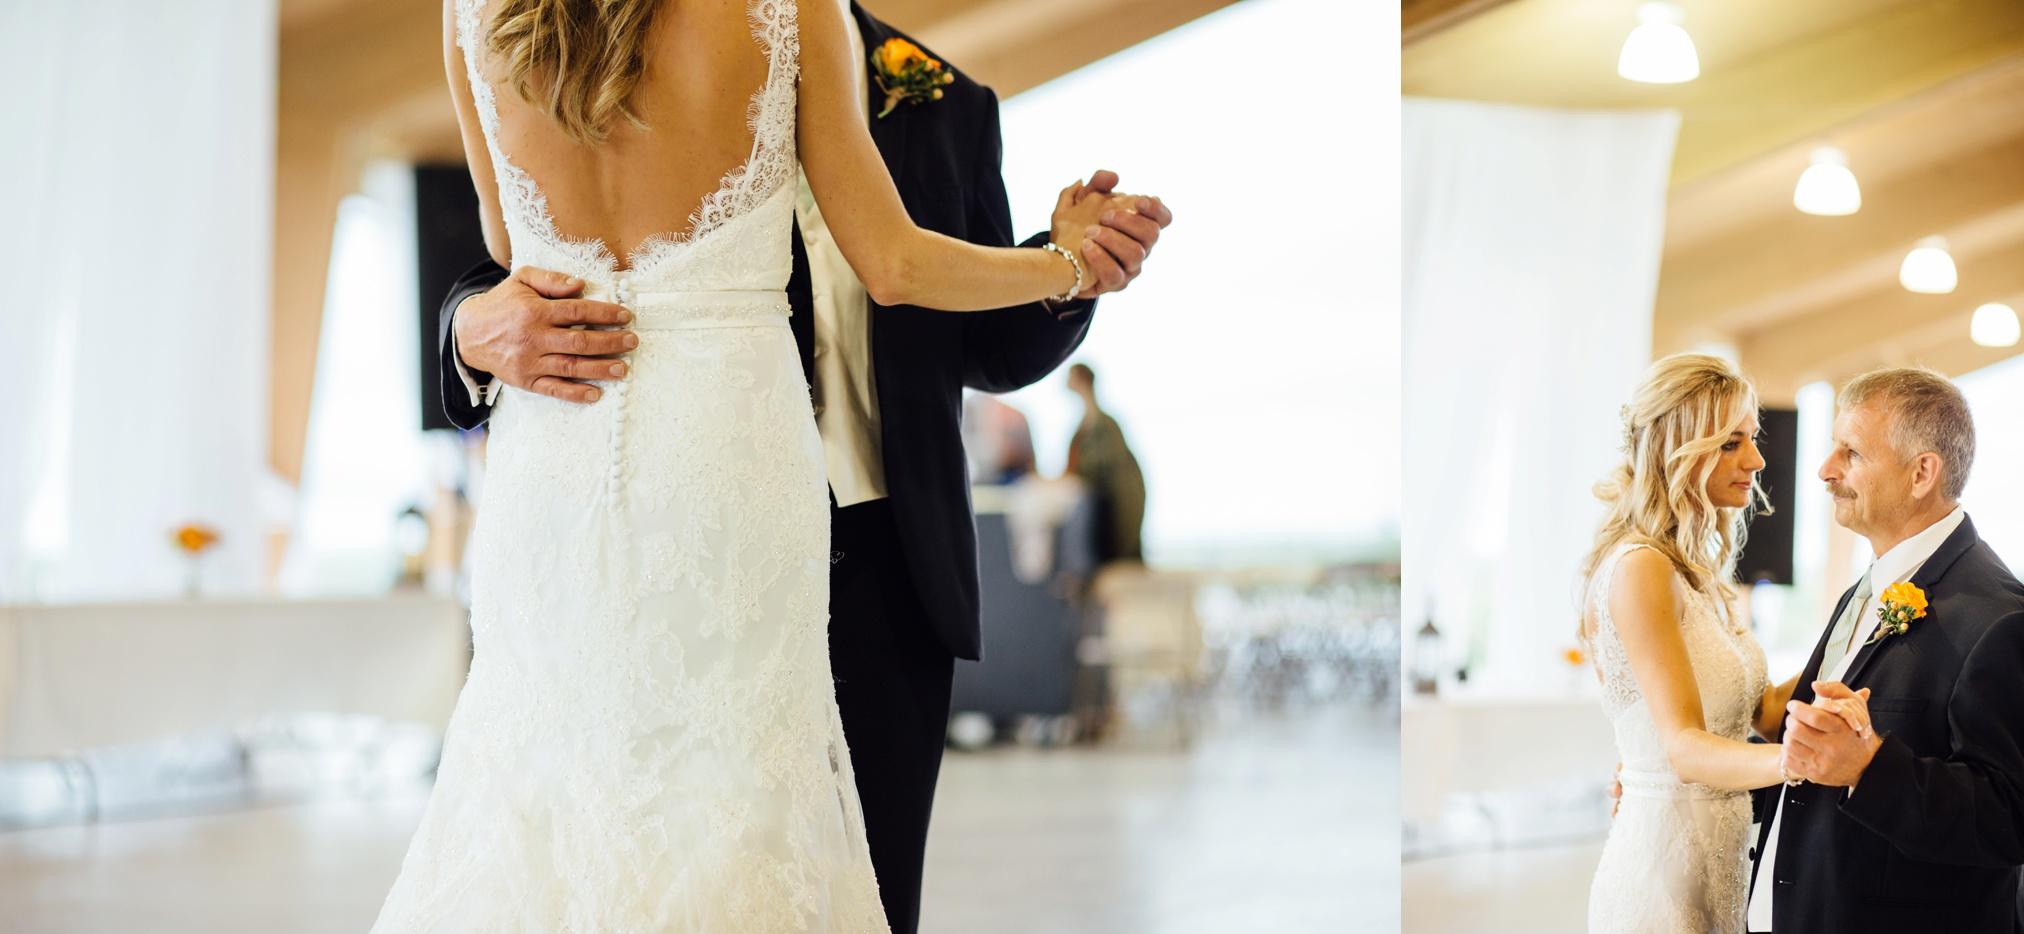 schmid_wedding-780.jpg